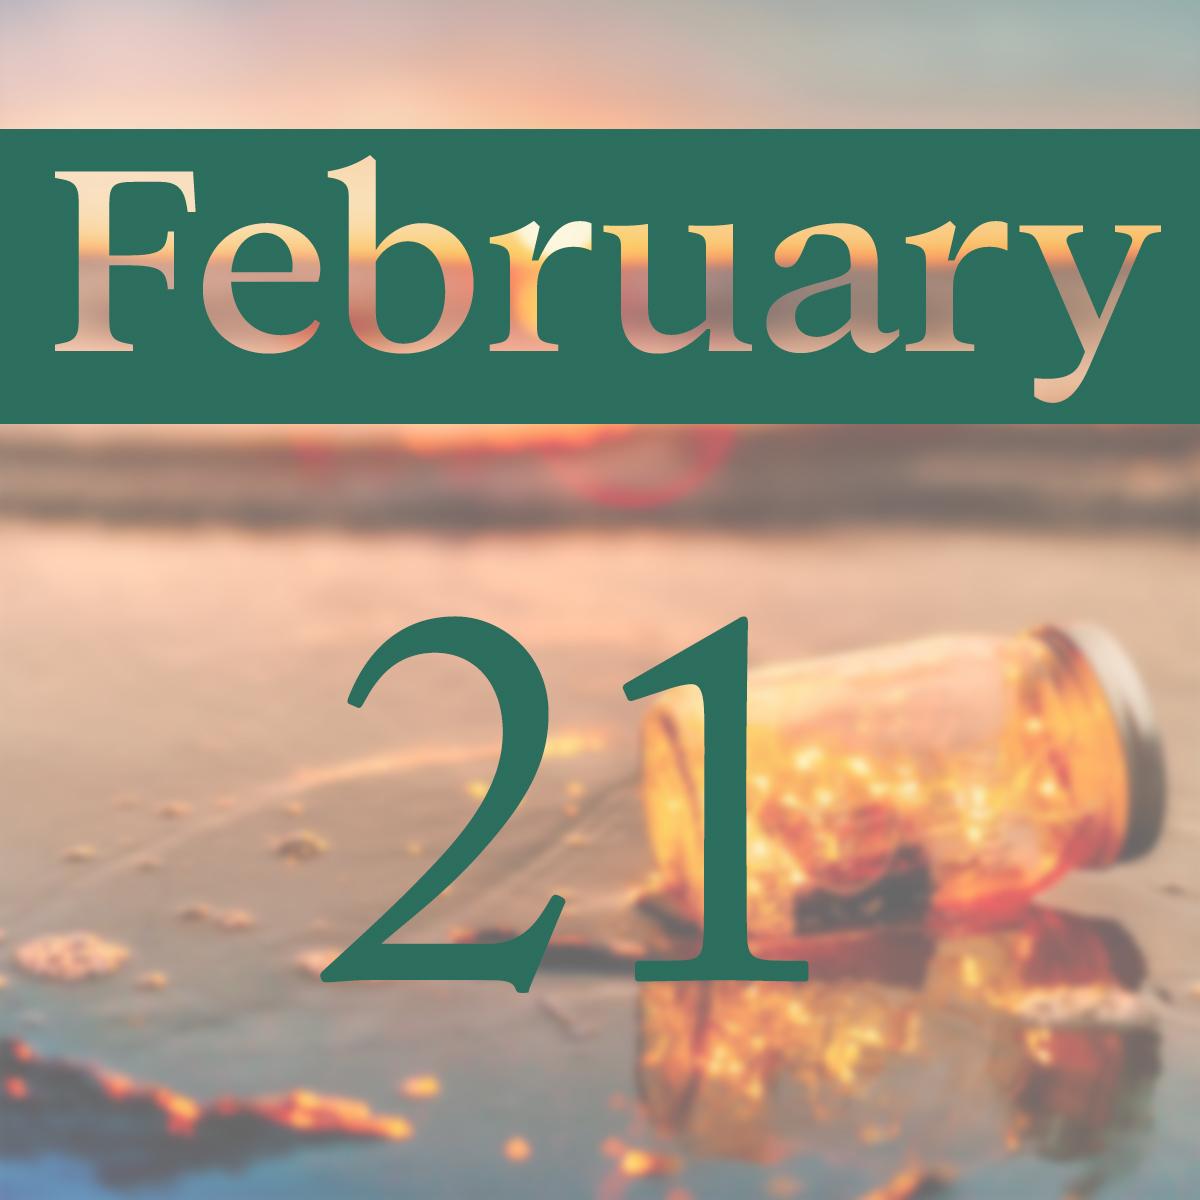 Friday, February 21st